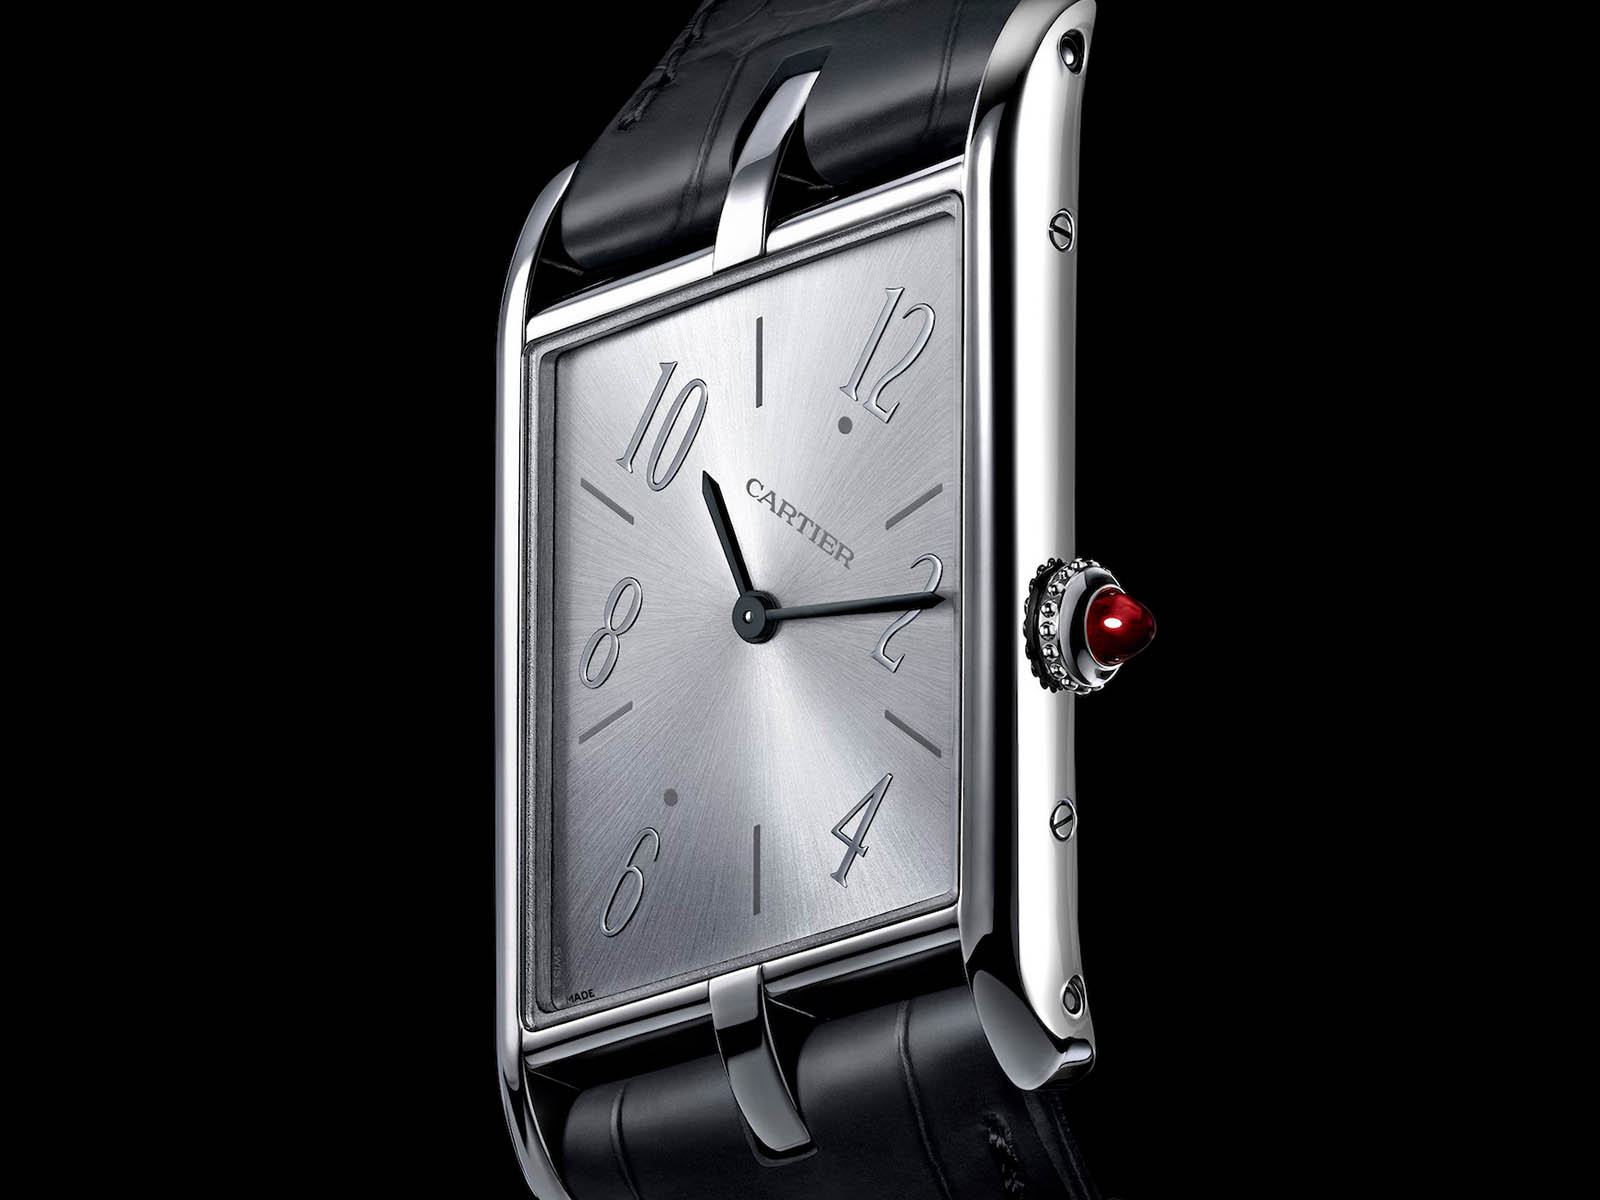 cartier-tank-asymetrique-watches-wonders-2020-3.jpg